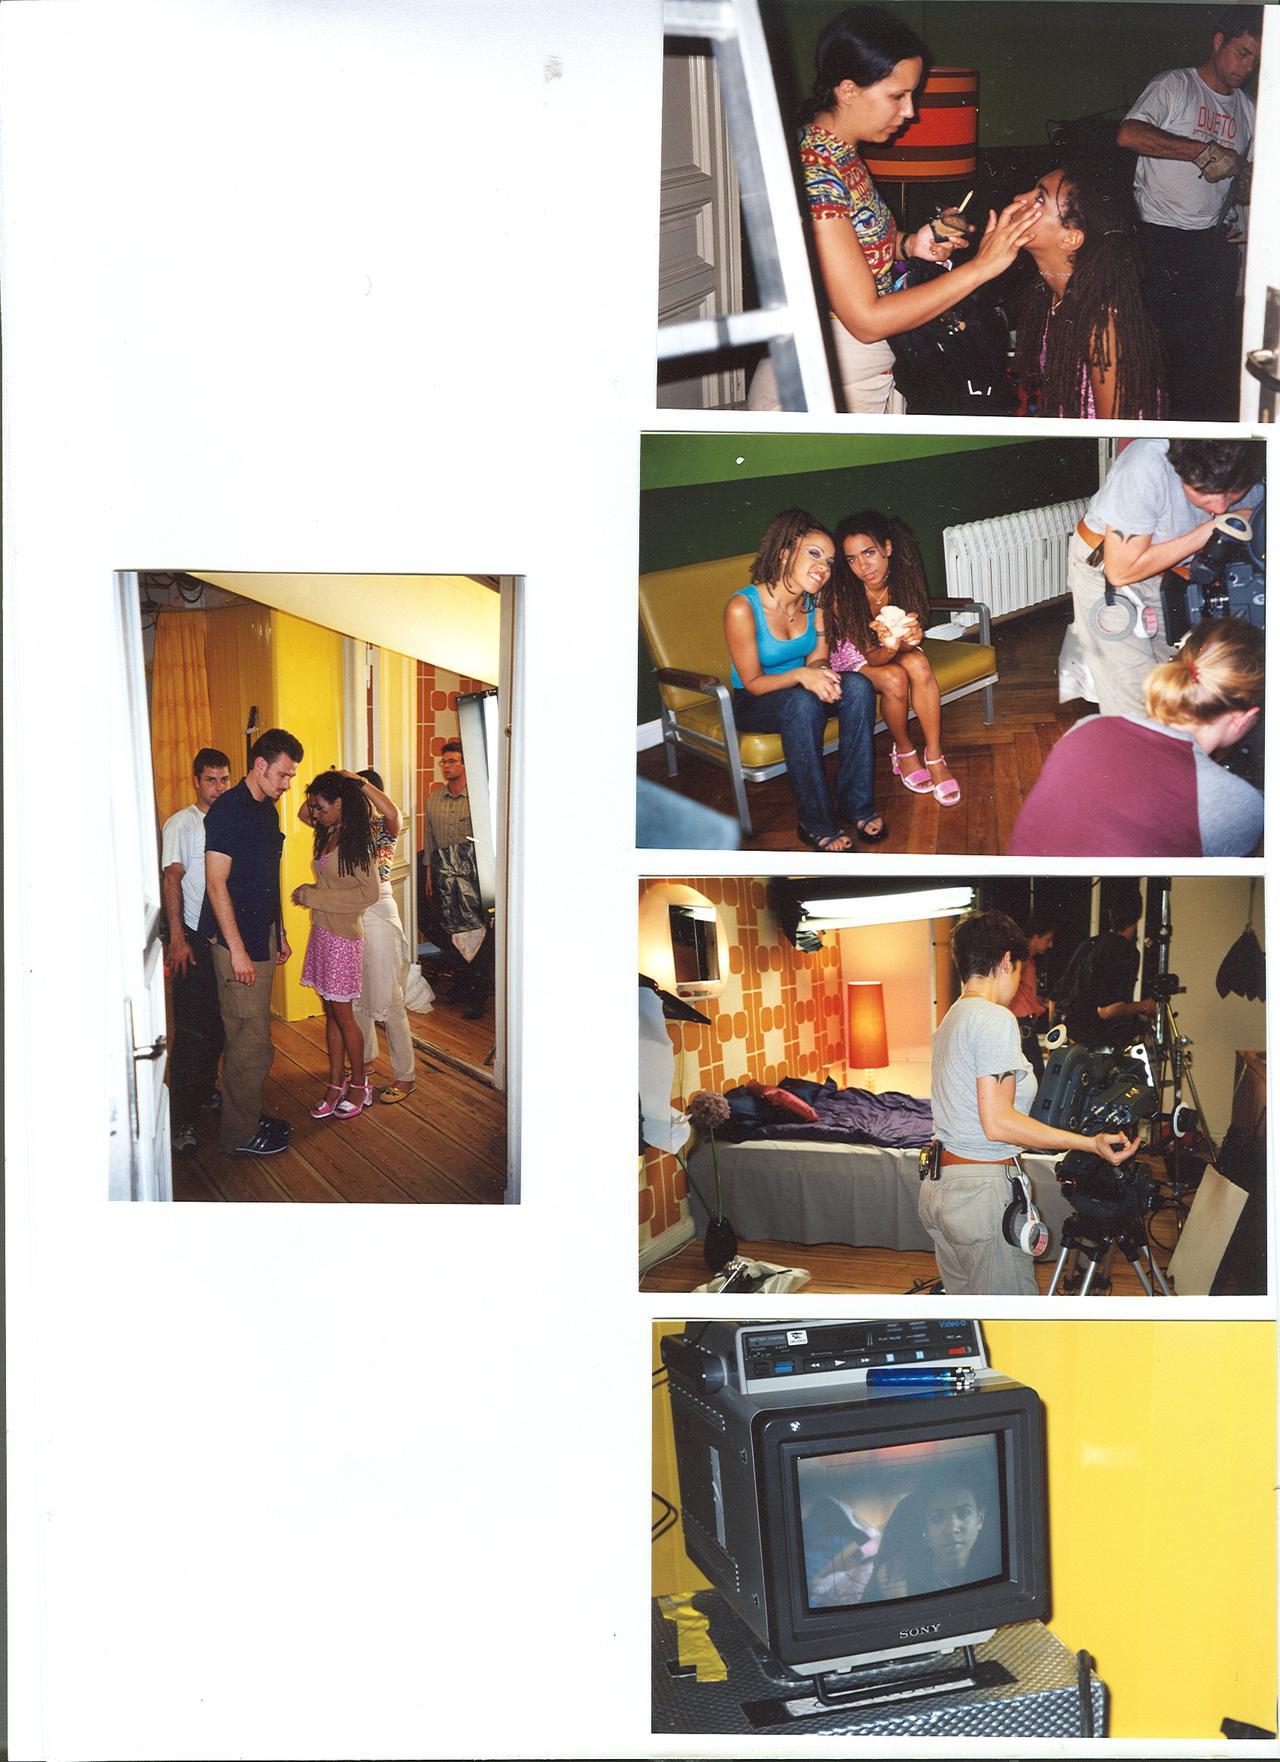 RiCKY & LAURA 1999